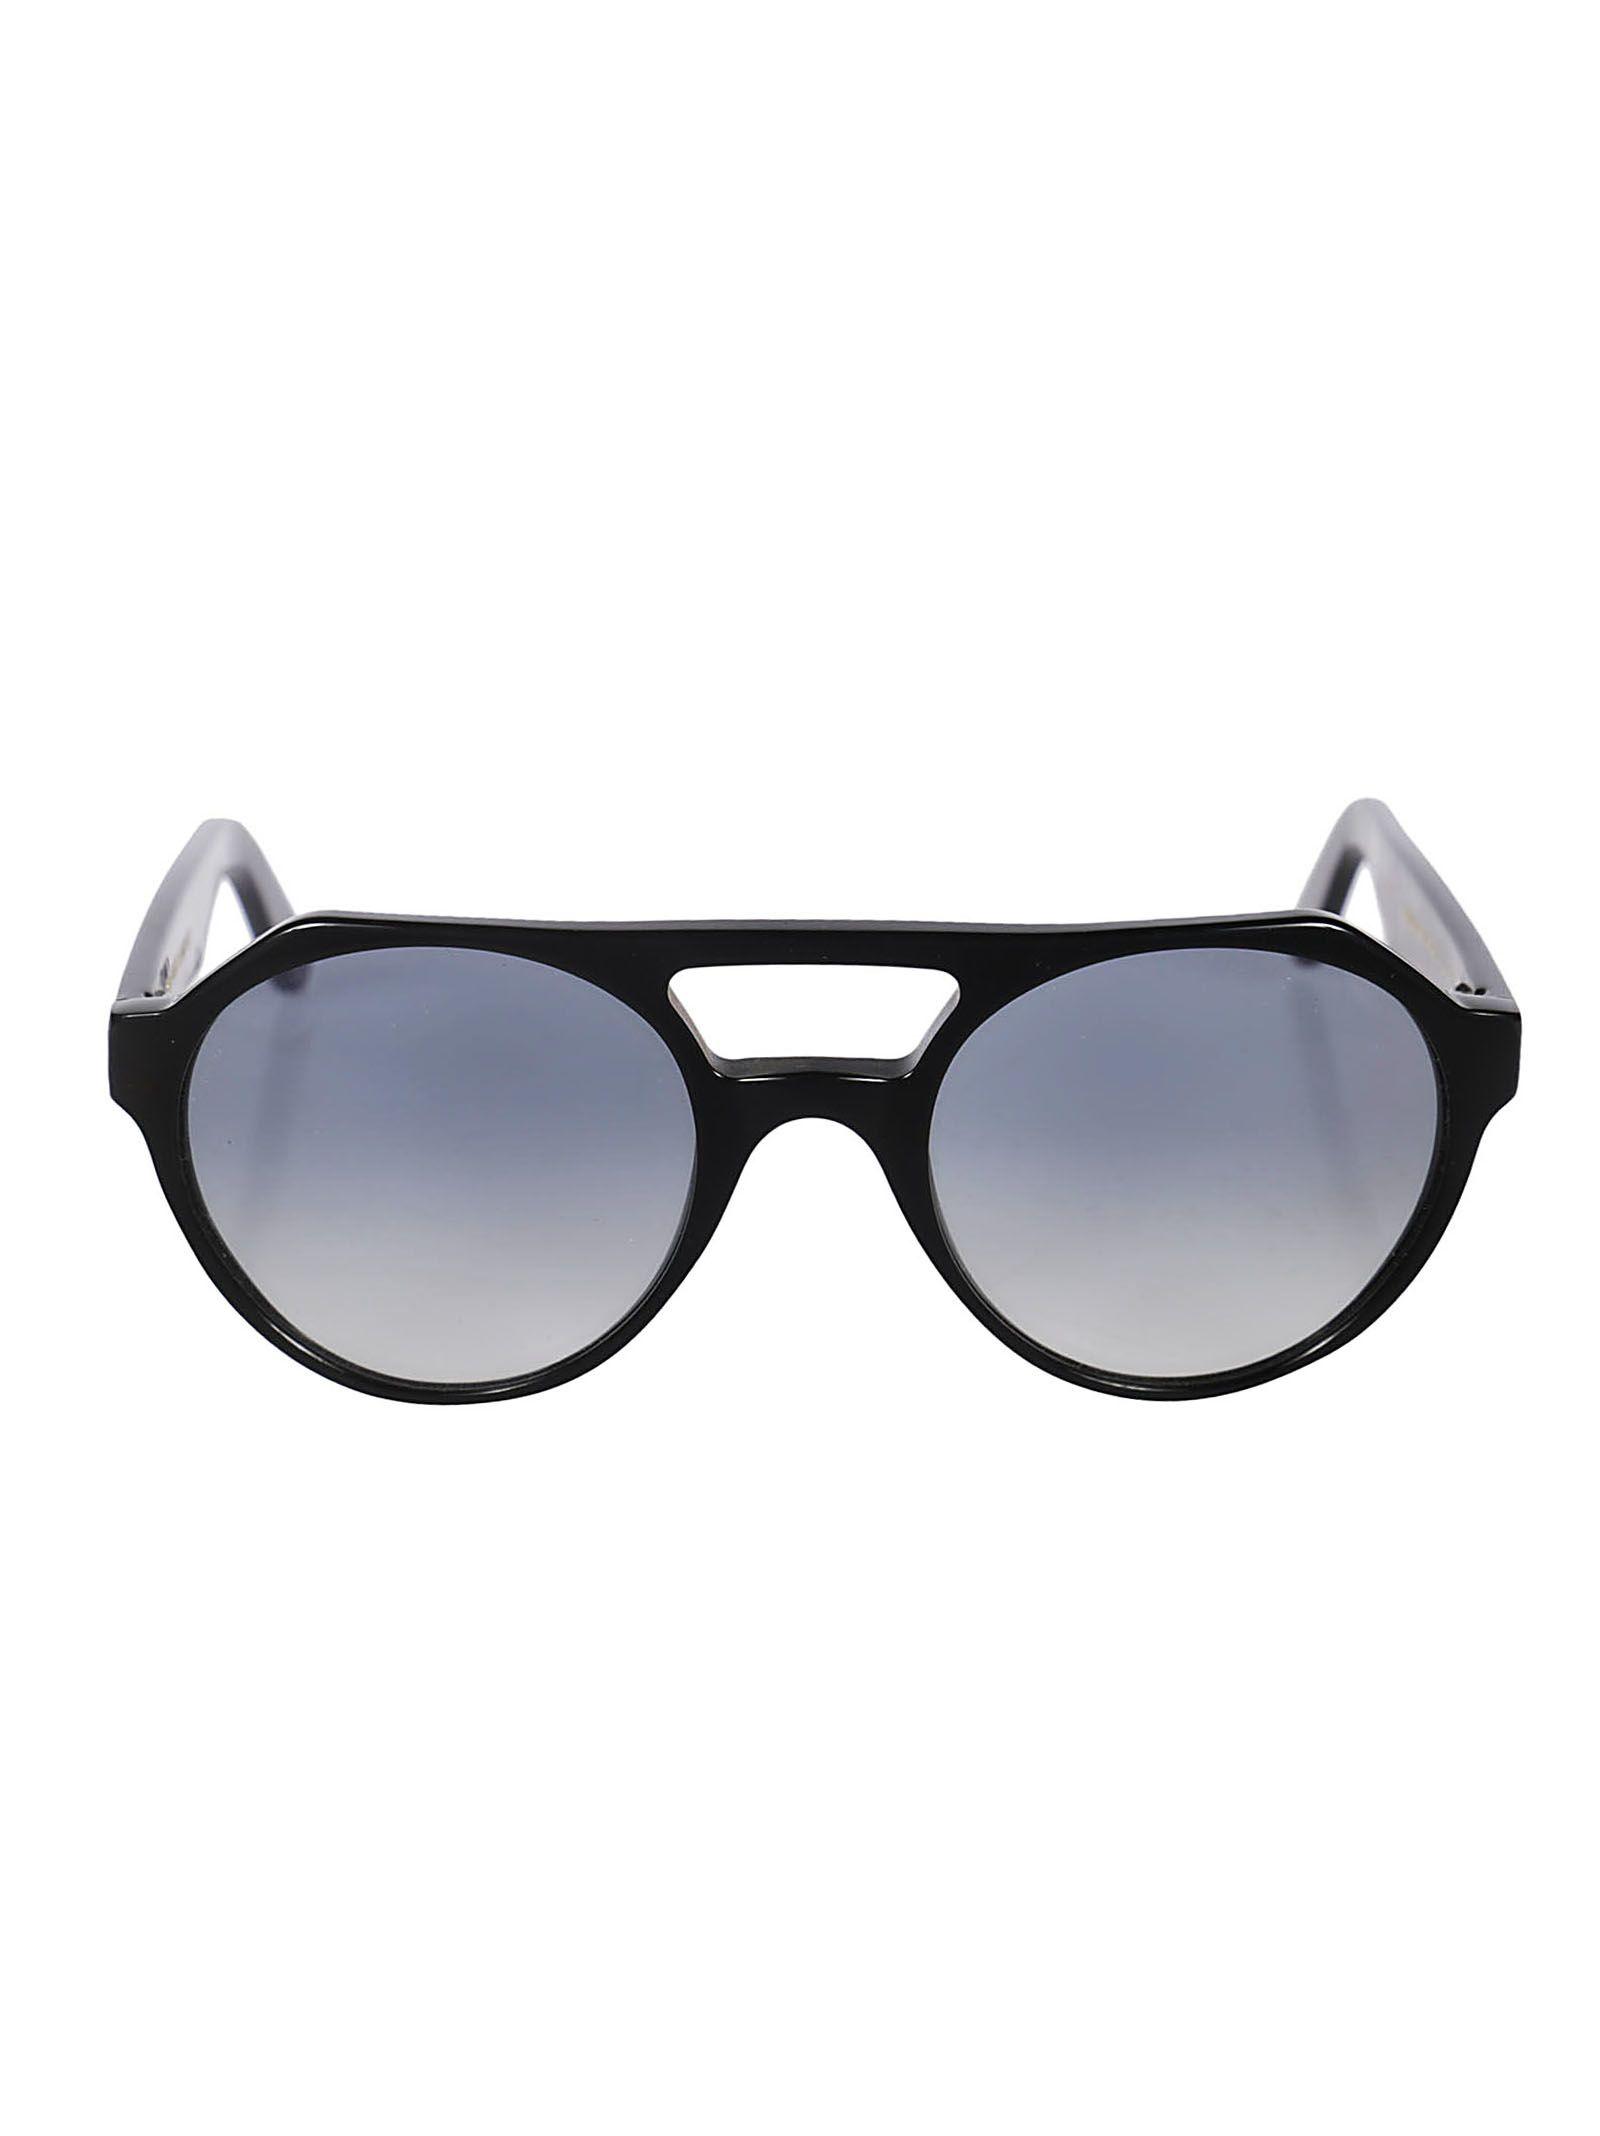 L.G.R Lgr Cape Town Sunglasses in Black Photo